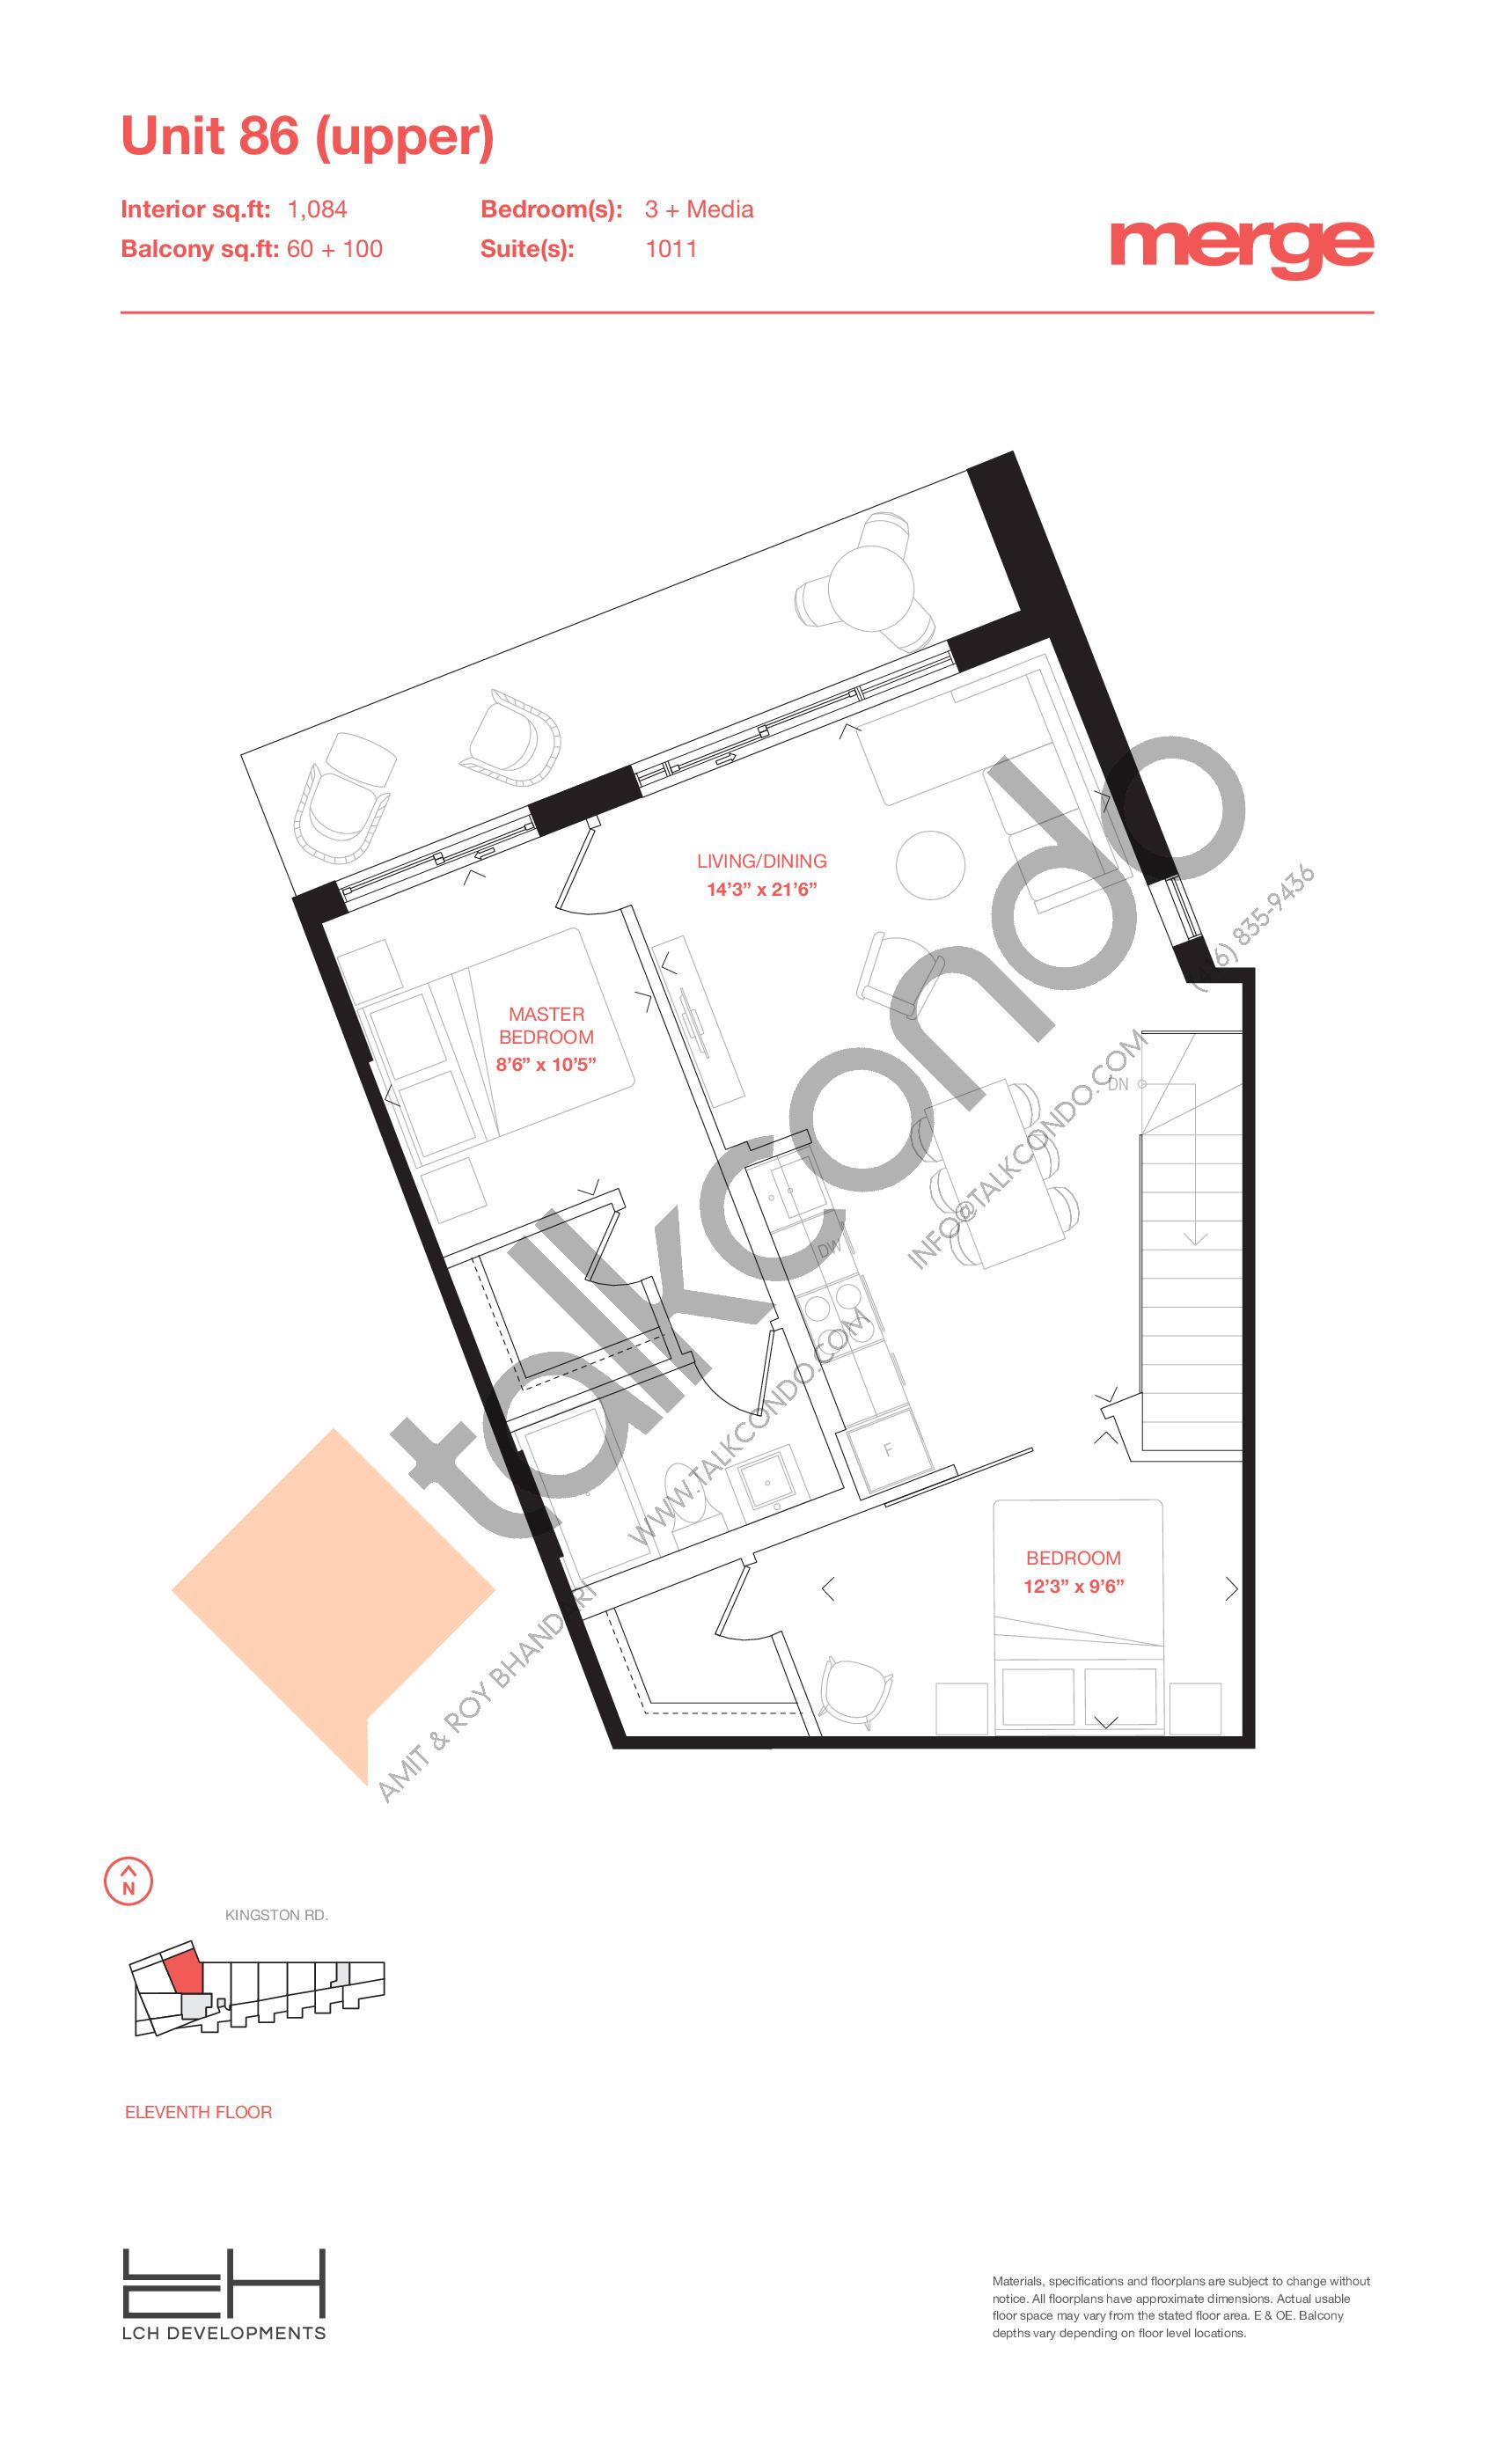 Unit 86 (Upper) - 2 Storey Floor Plan at Merge Condos - 1084 sq.ft